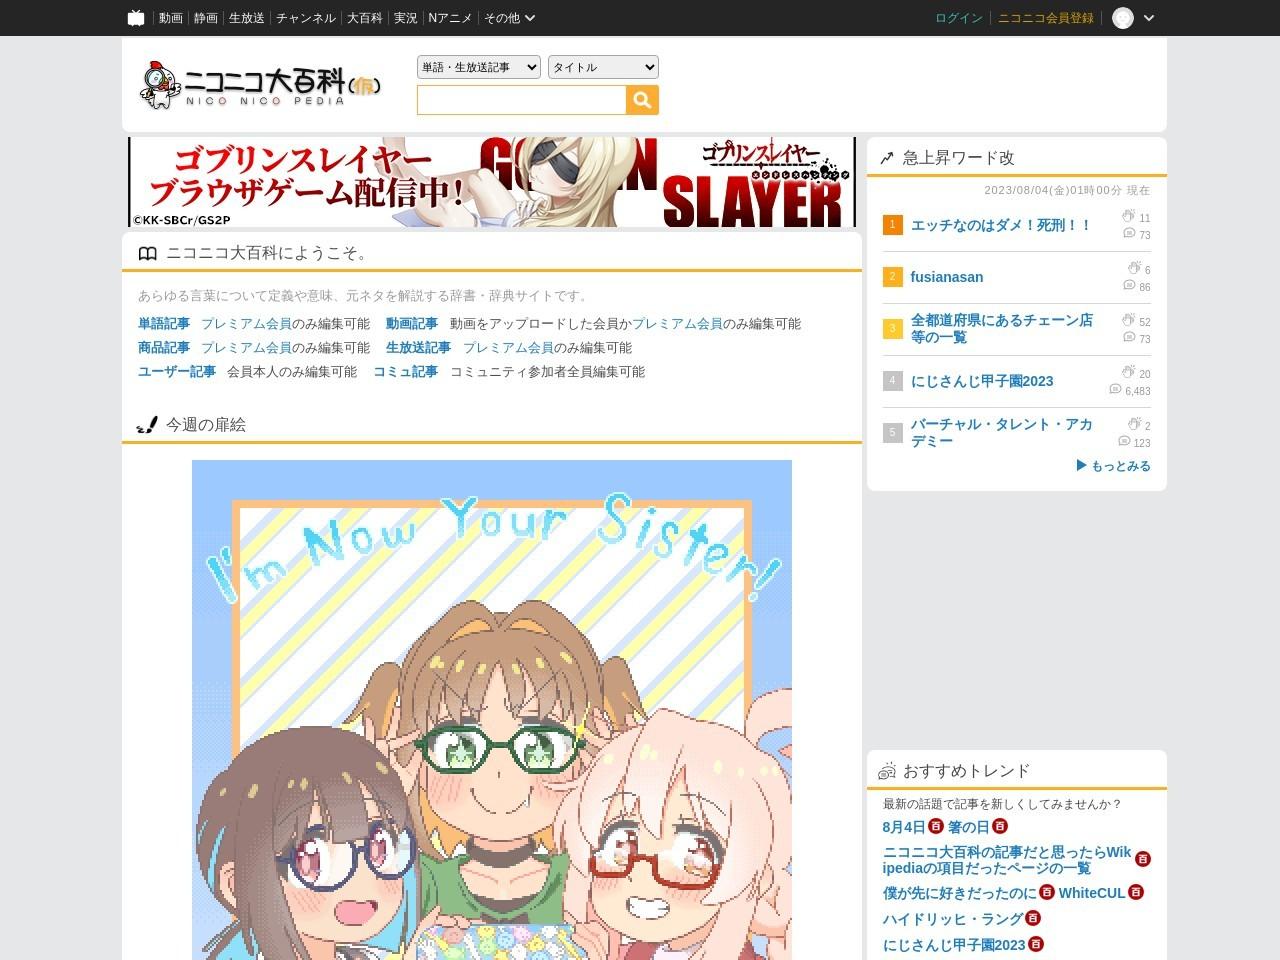 https://dic.nicovideo.jp/a/%E3%83%91%E3%83%B3%E3%81%AE%E4%B8%80%E8%A6%A7のプレビュー画像